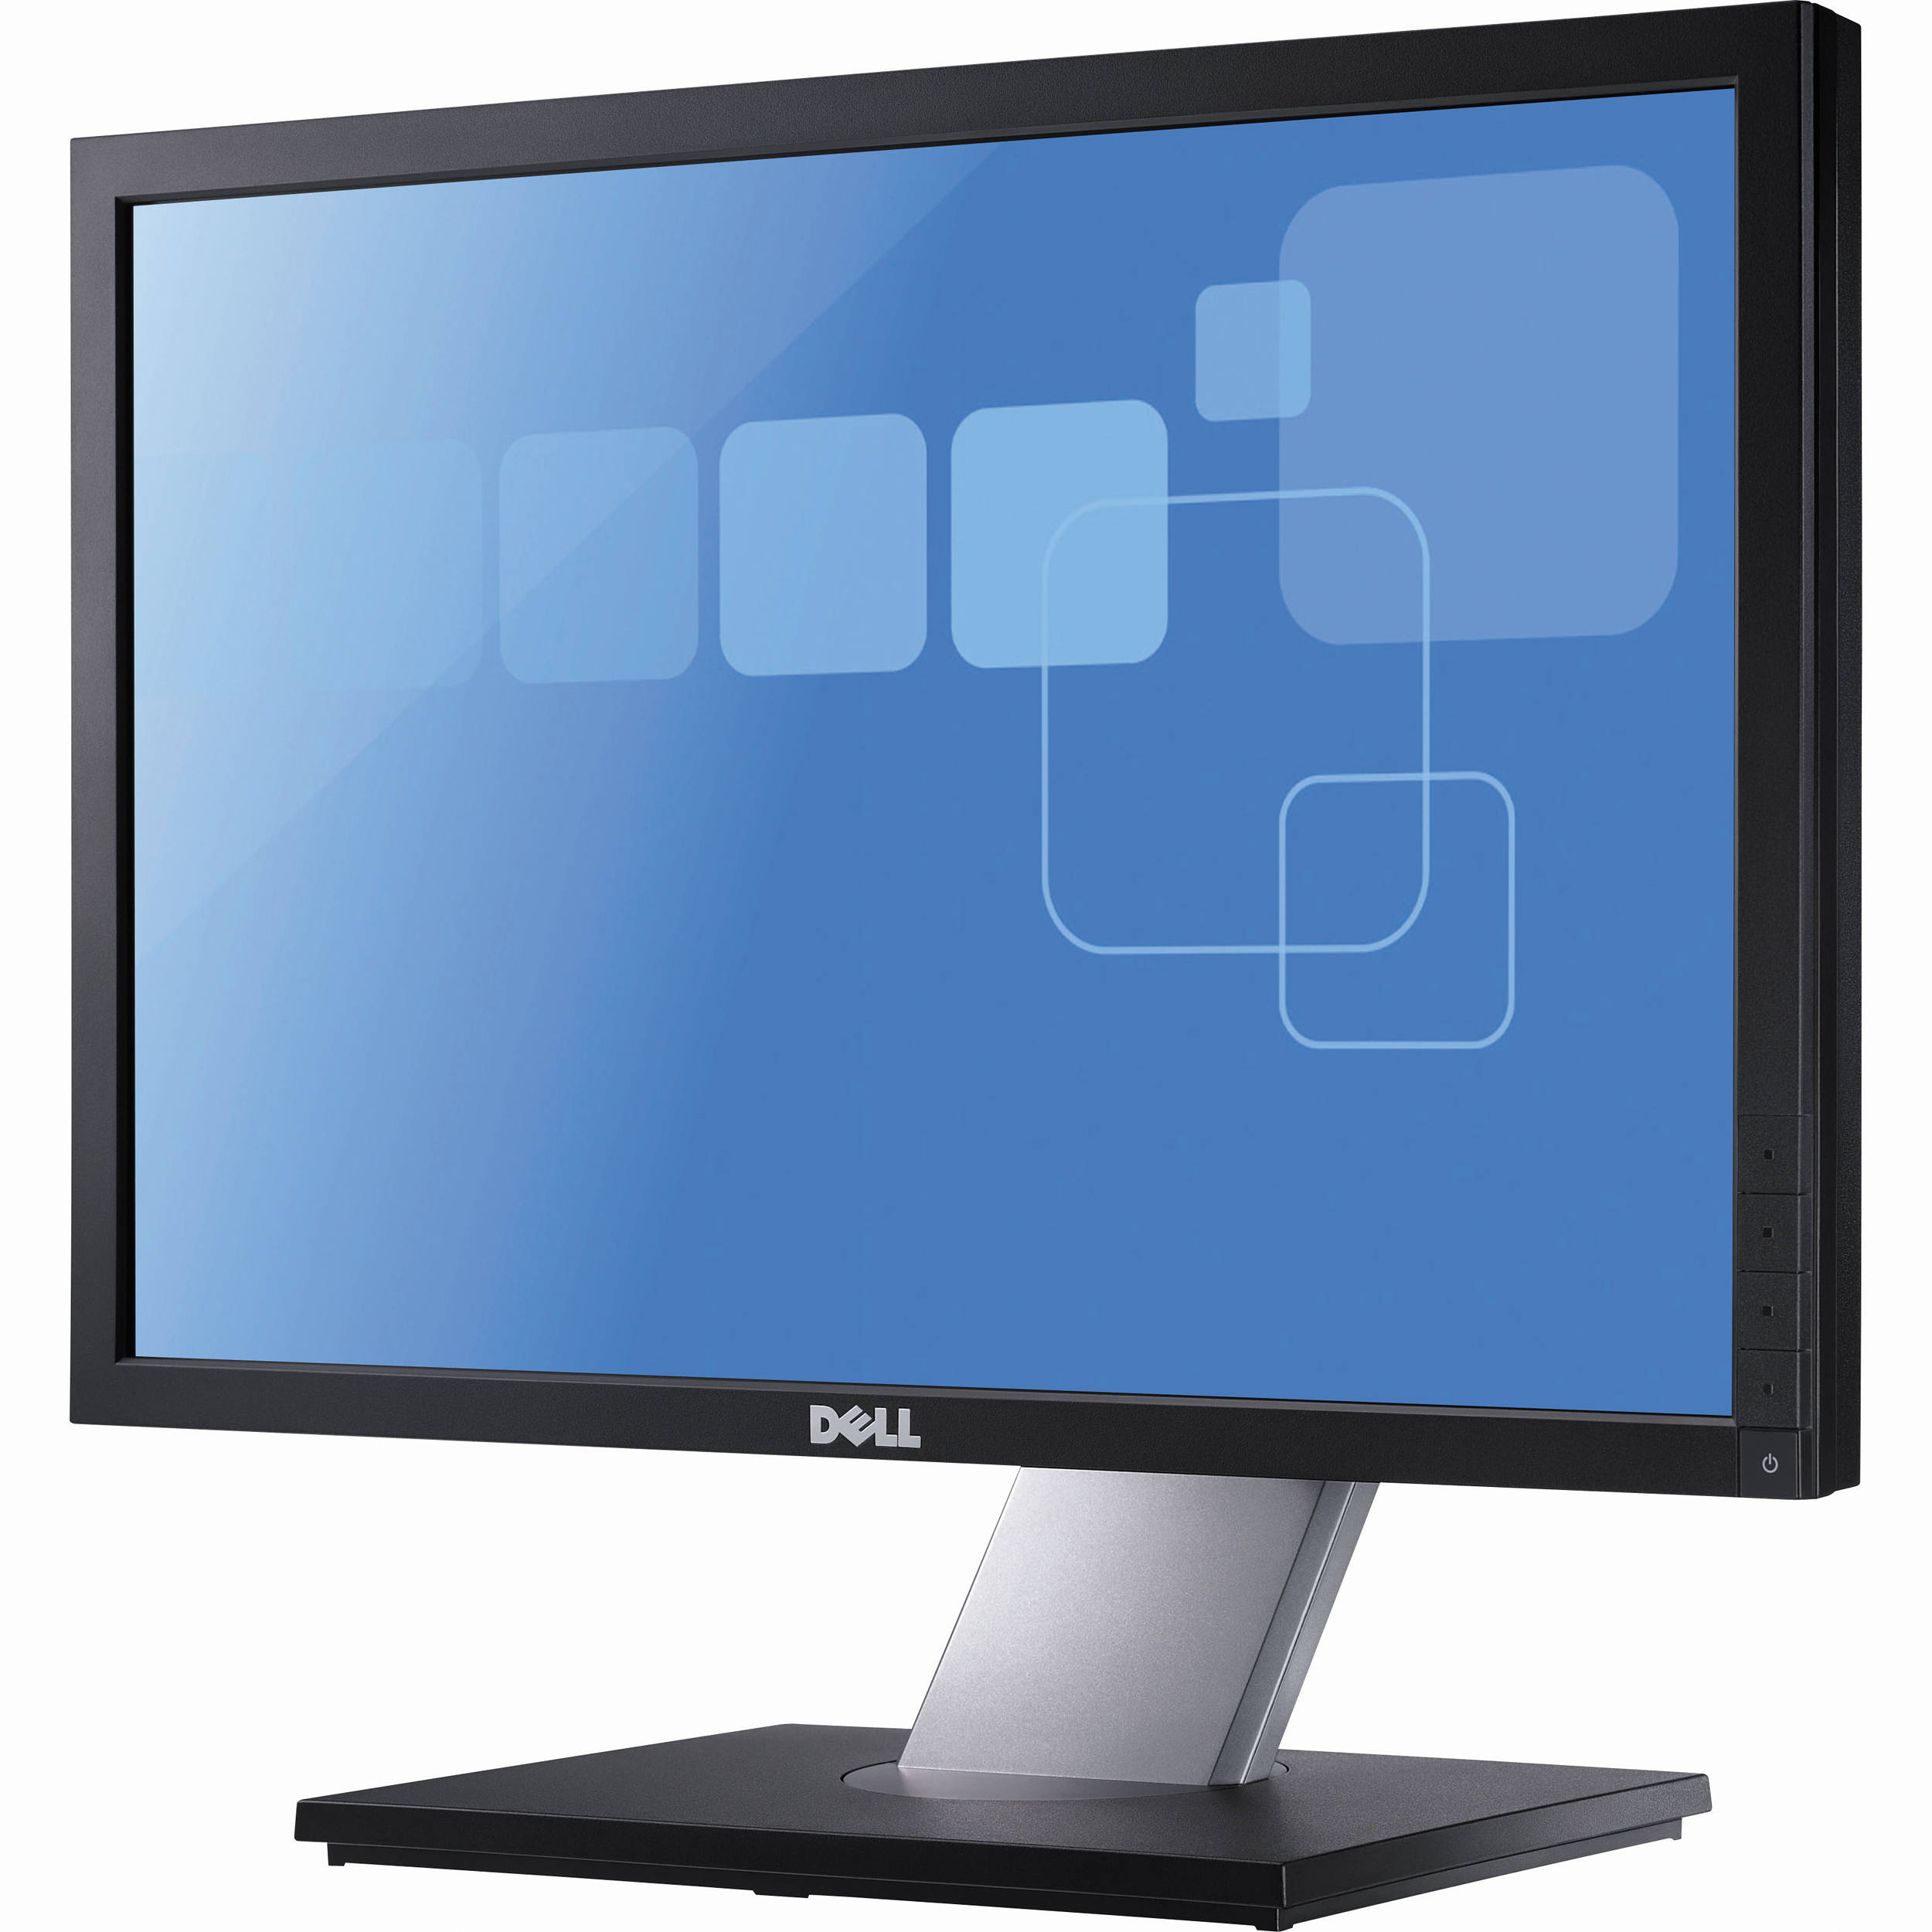 "Power /& Vga cable dvi cable Dell Professional P1911 19/"" LCD Monitor"